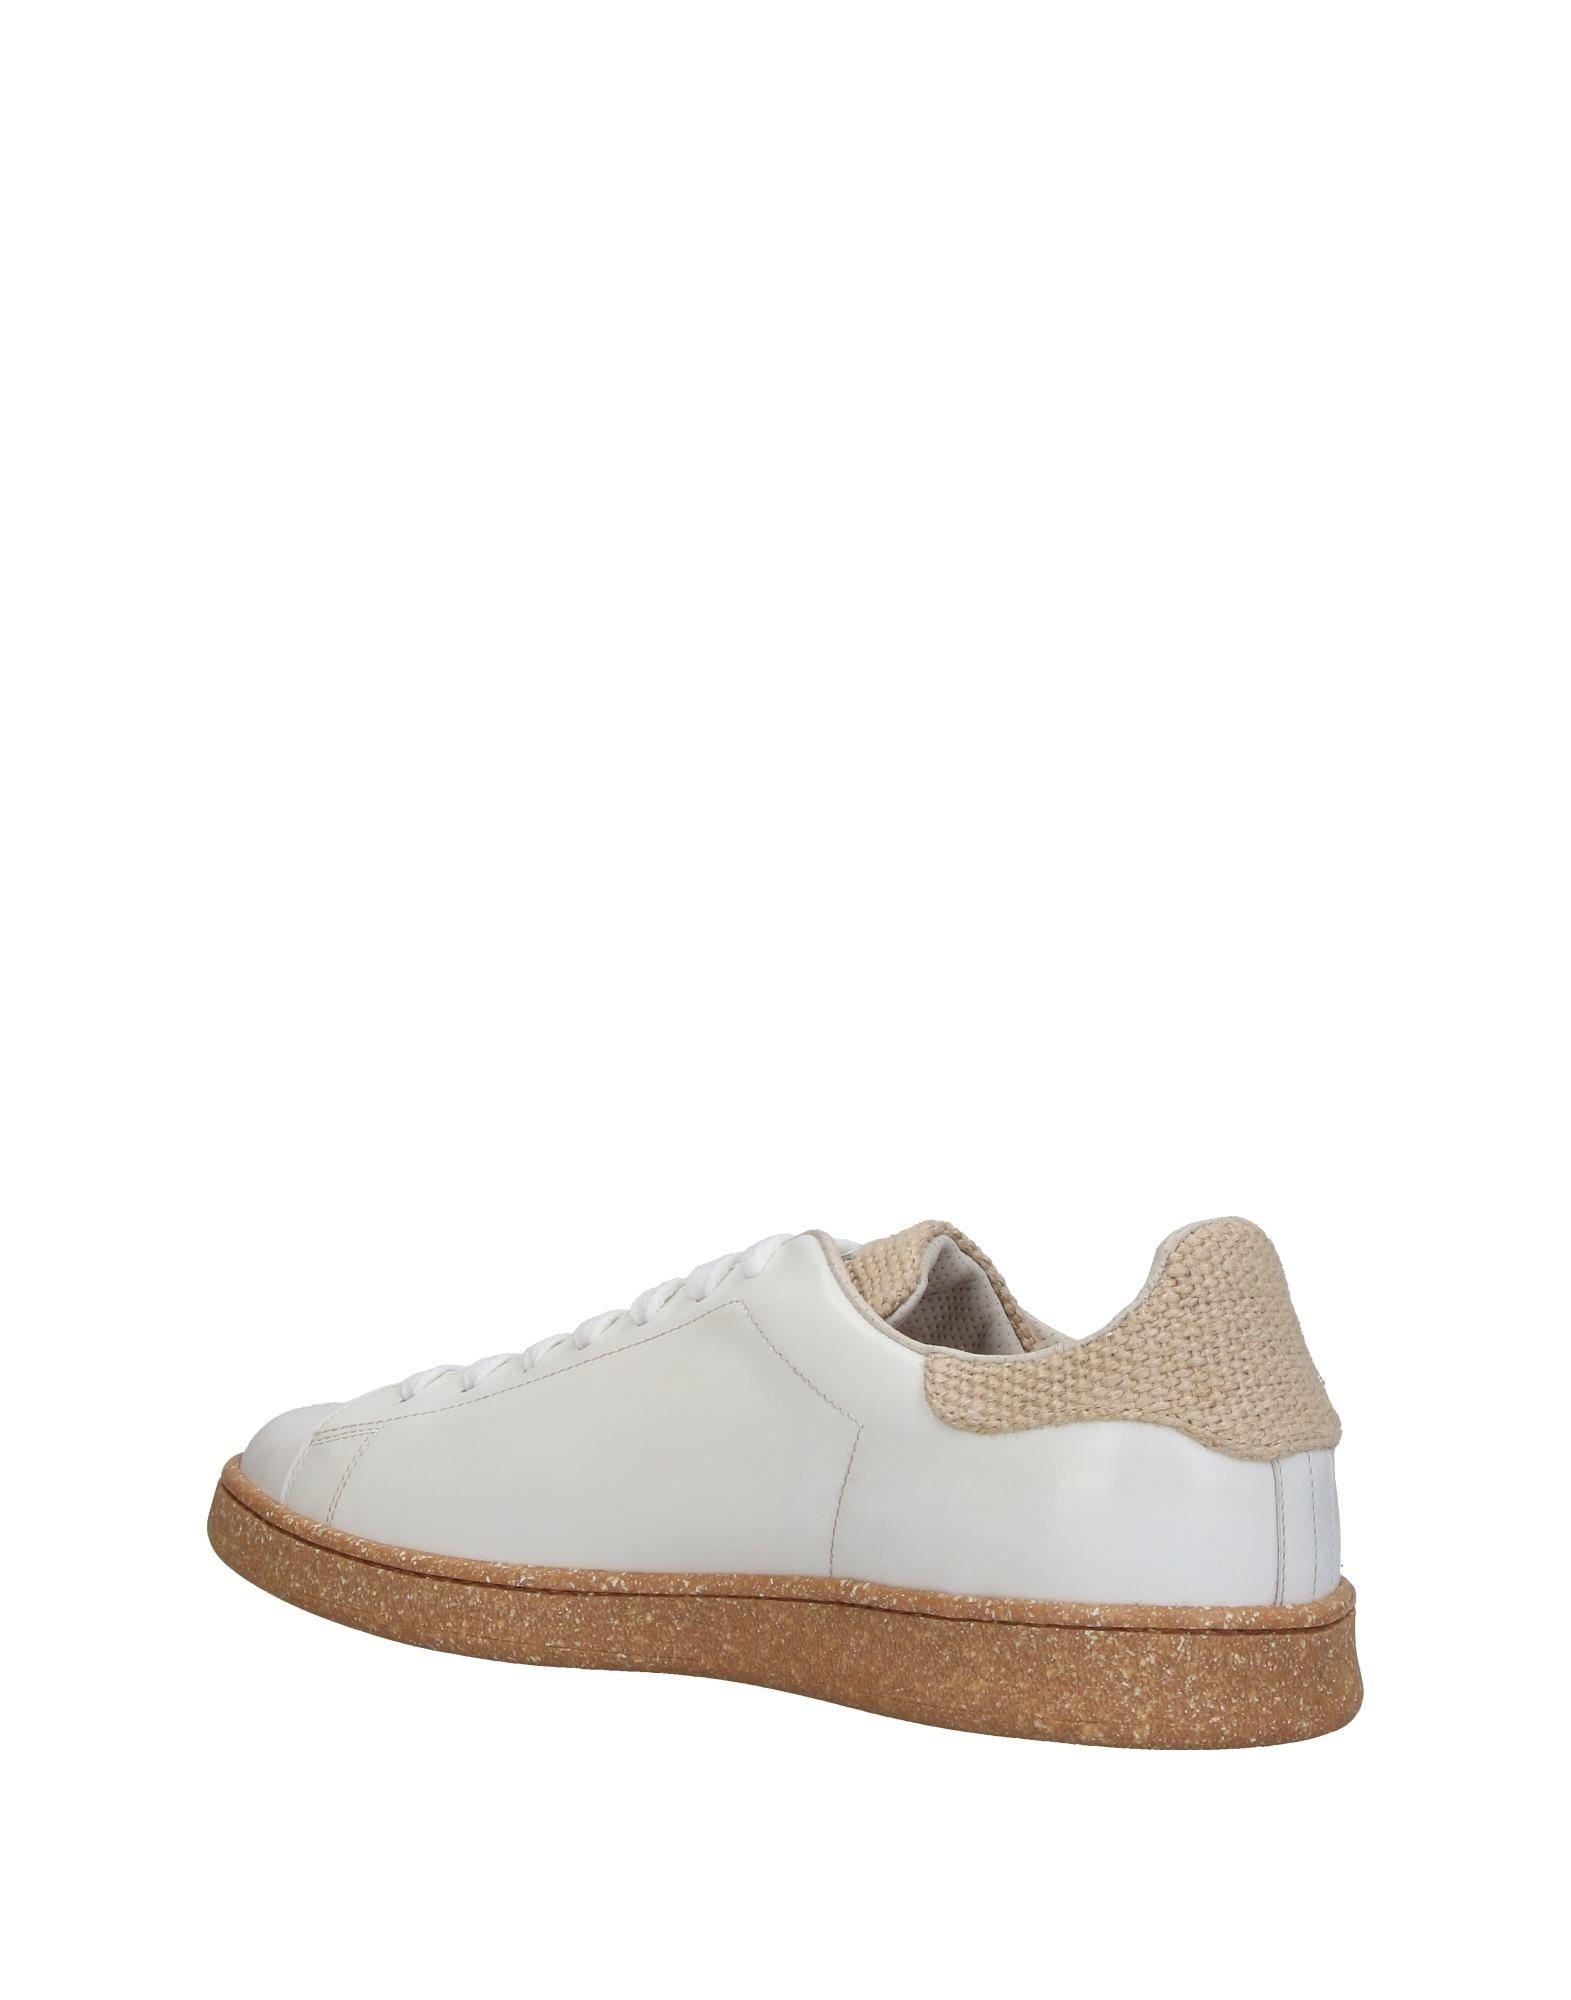 Sneakers Brunello Cucinelli Homme - Sneakers Brunello Cucinelli sur